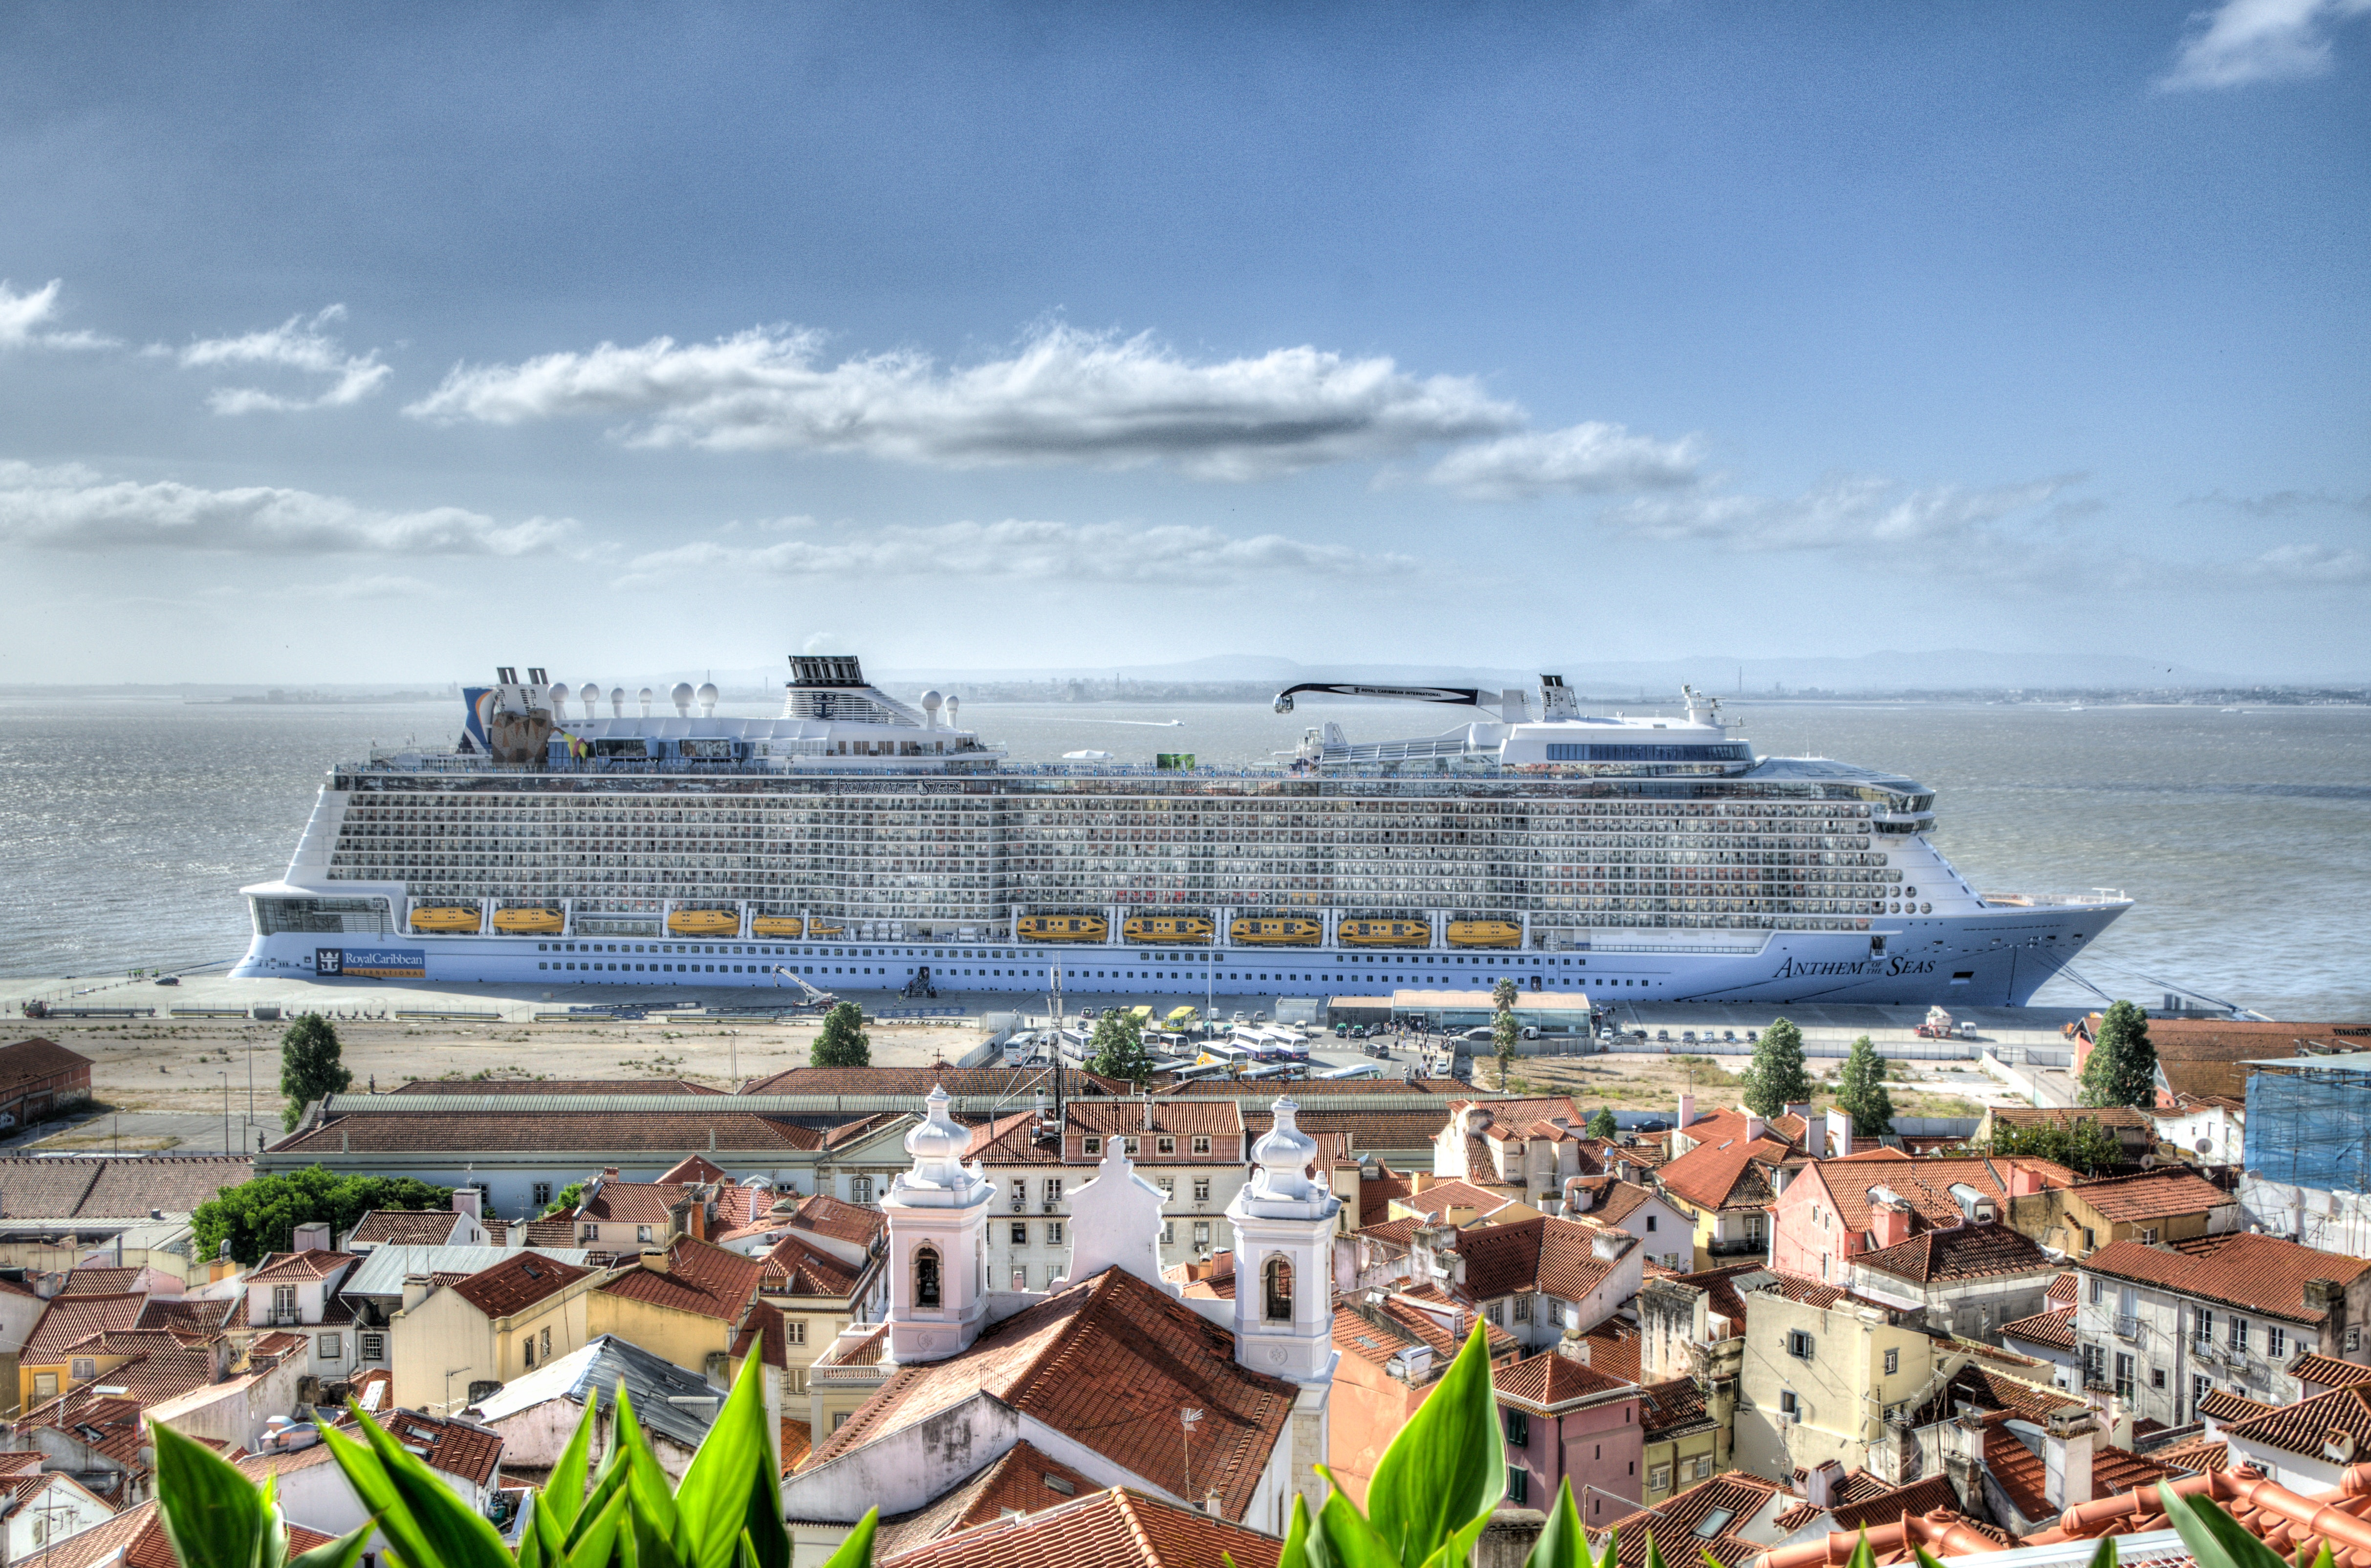 Retiring on a Cruise Ship